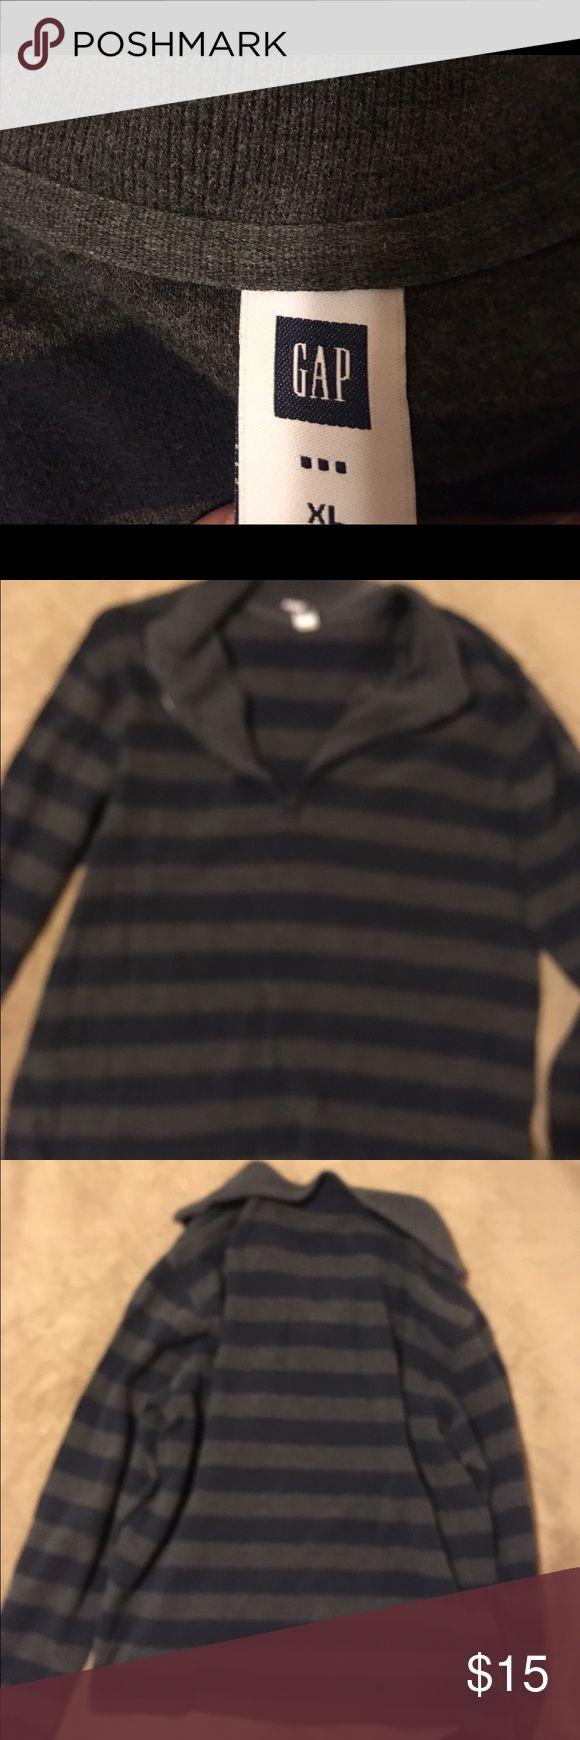 GAP men's half zip sweater jacket Navy and grey striped. GAP brand. Men's size XL. Good condition GAP Jackets & Coats Lightweight & Shirt Jackets